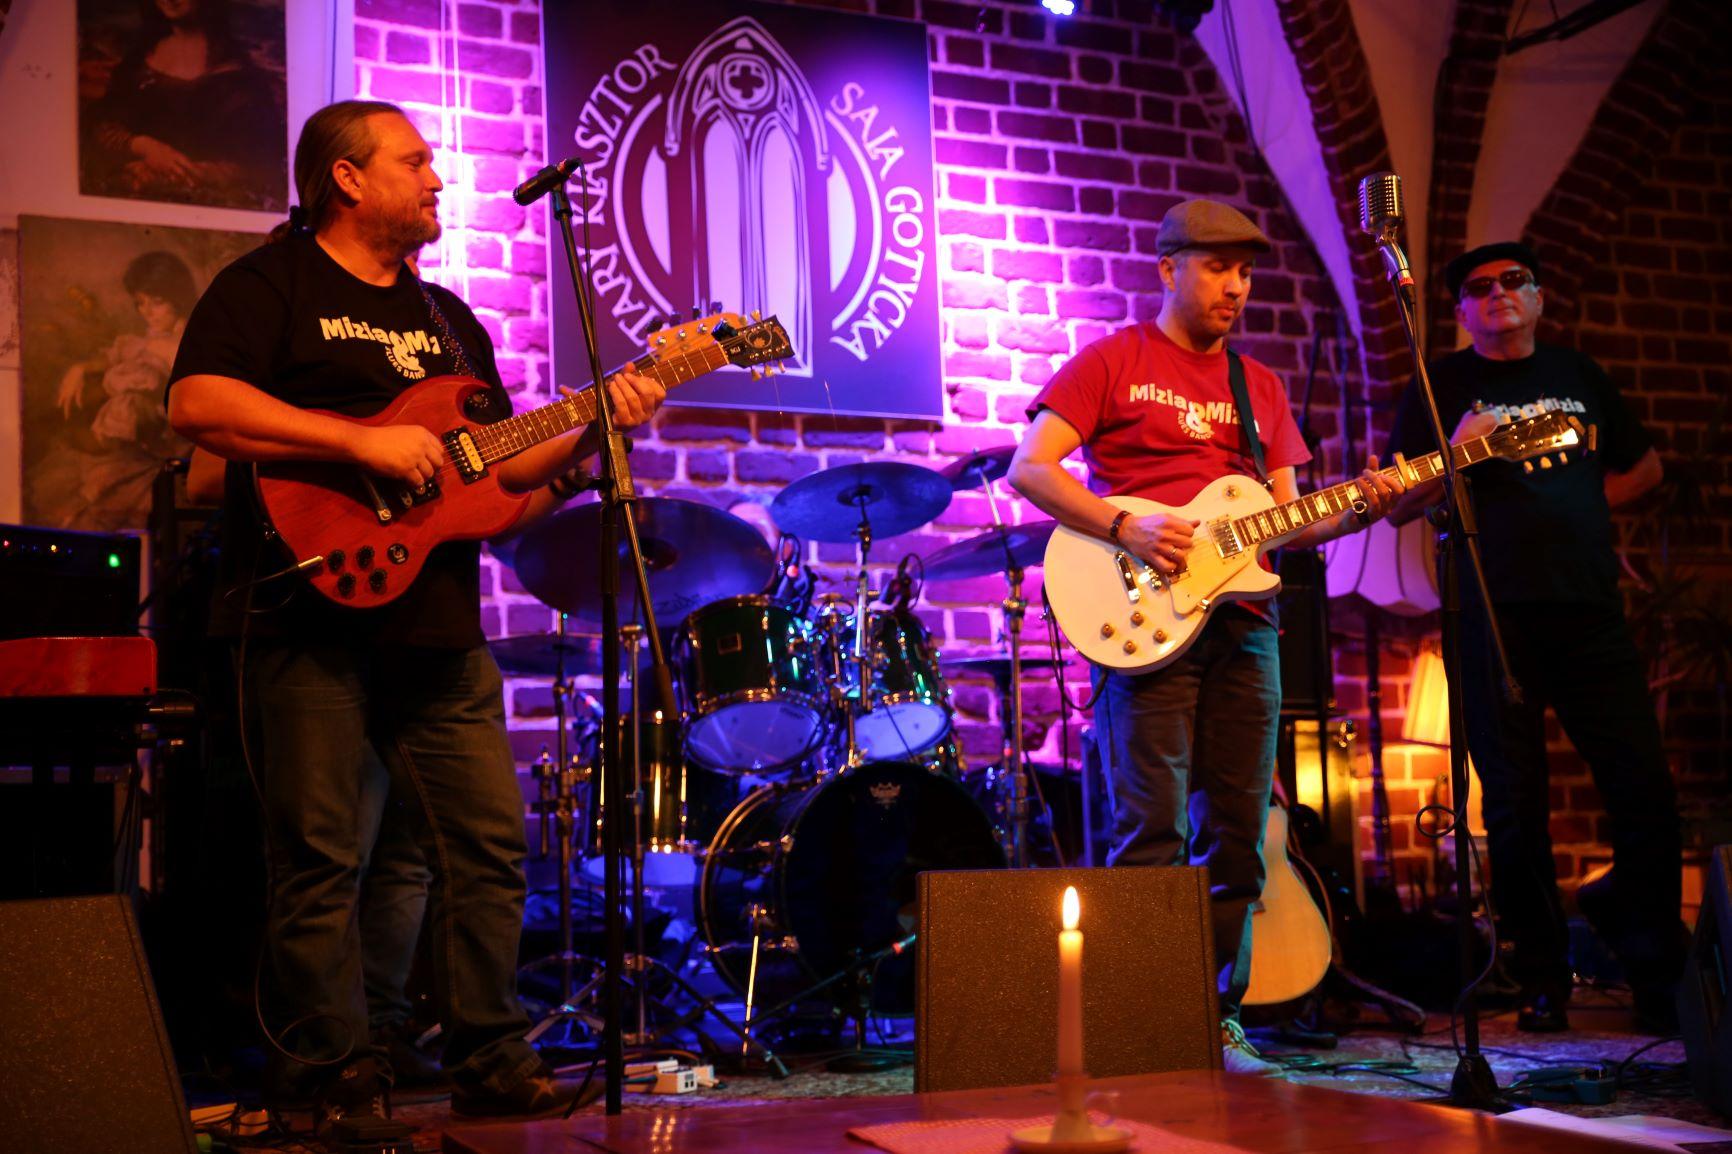 Mizia & Mizia Blues Band [fot. Bogdan Stawarz]